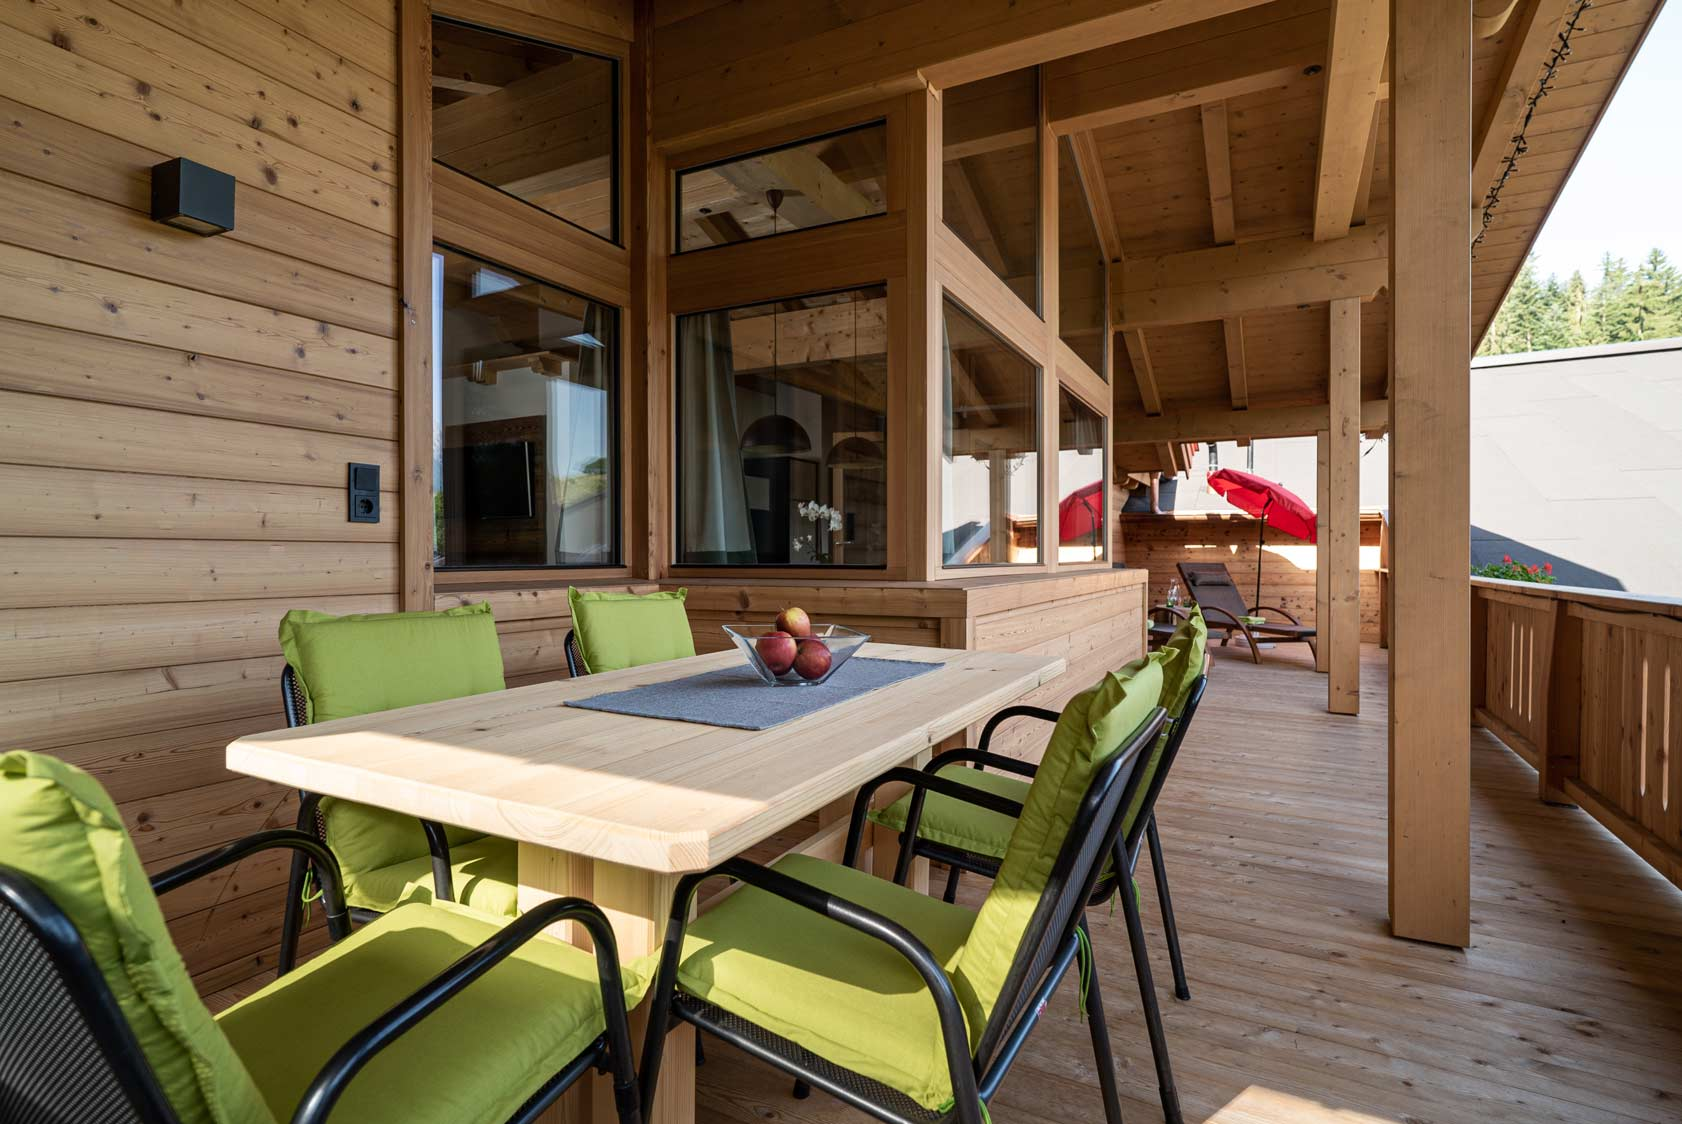 Auermühle Premium Penthouse Appartement – Esstisch auf Panorama-Balkon